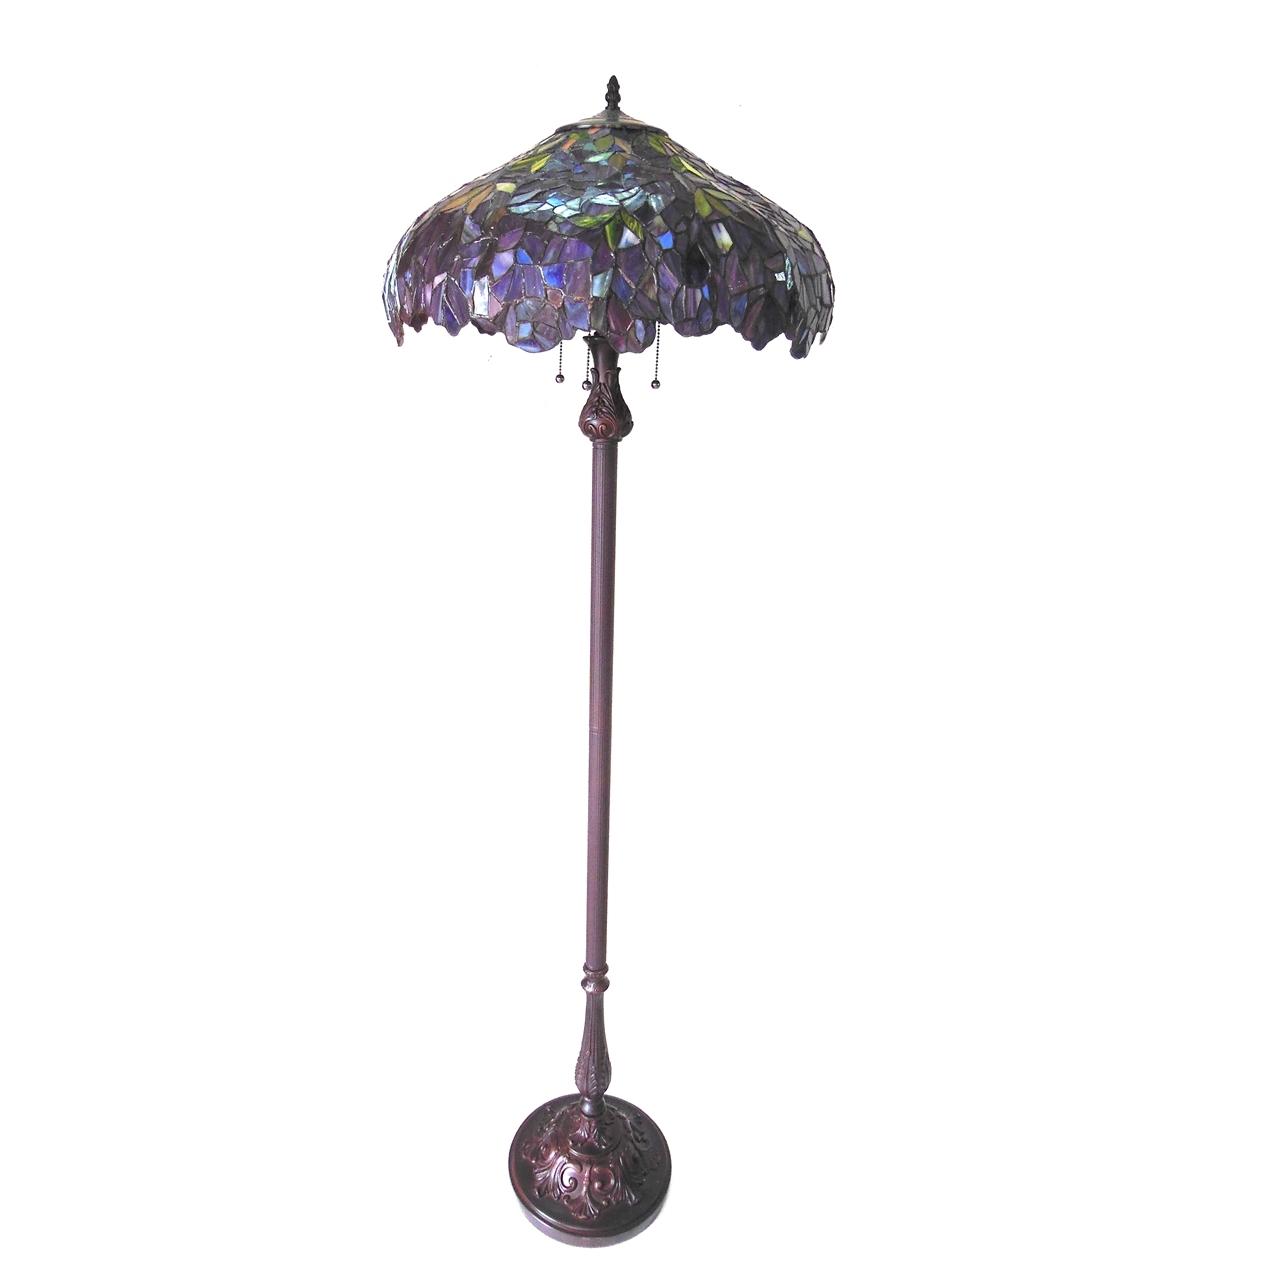 chloe lighting inc tiffany lamp tiffany lamps tiffany style lamp. Black Bedroom Furniture Sets. Home Design Ideas